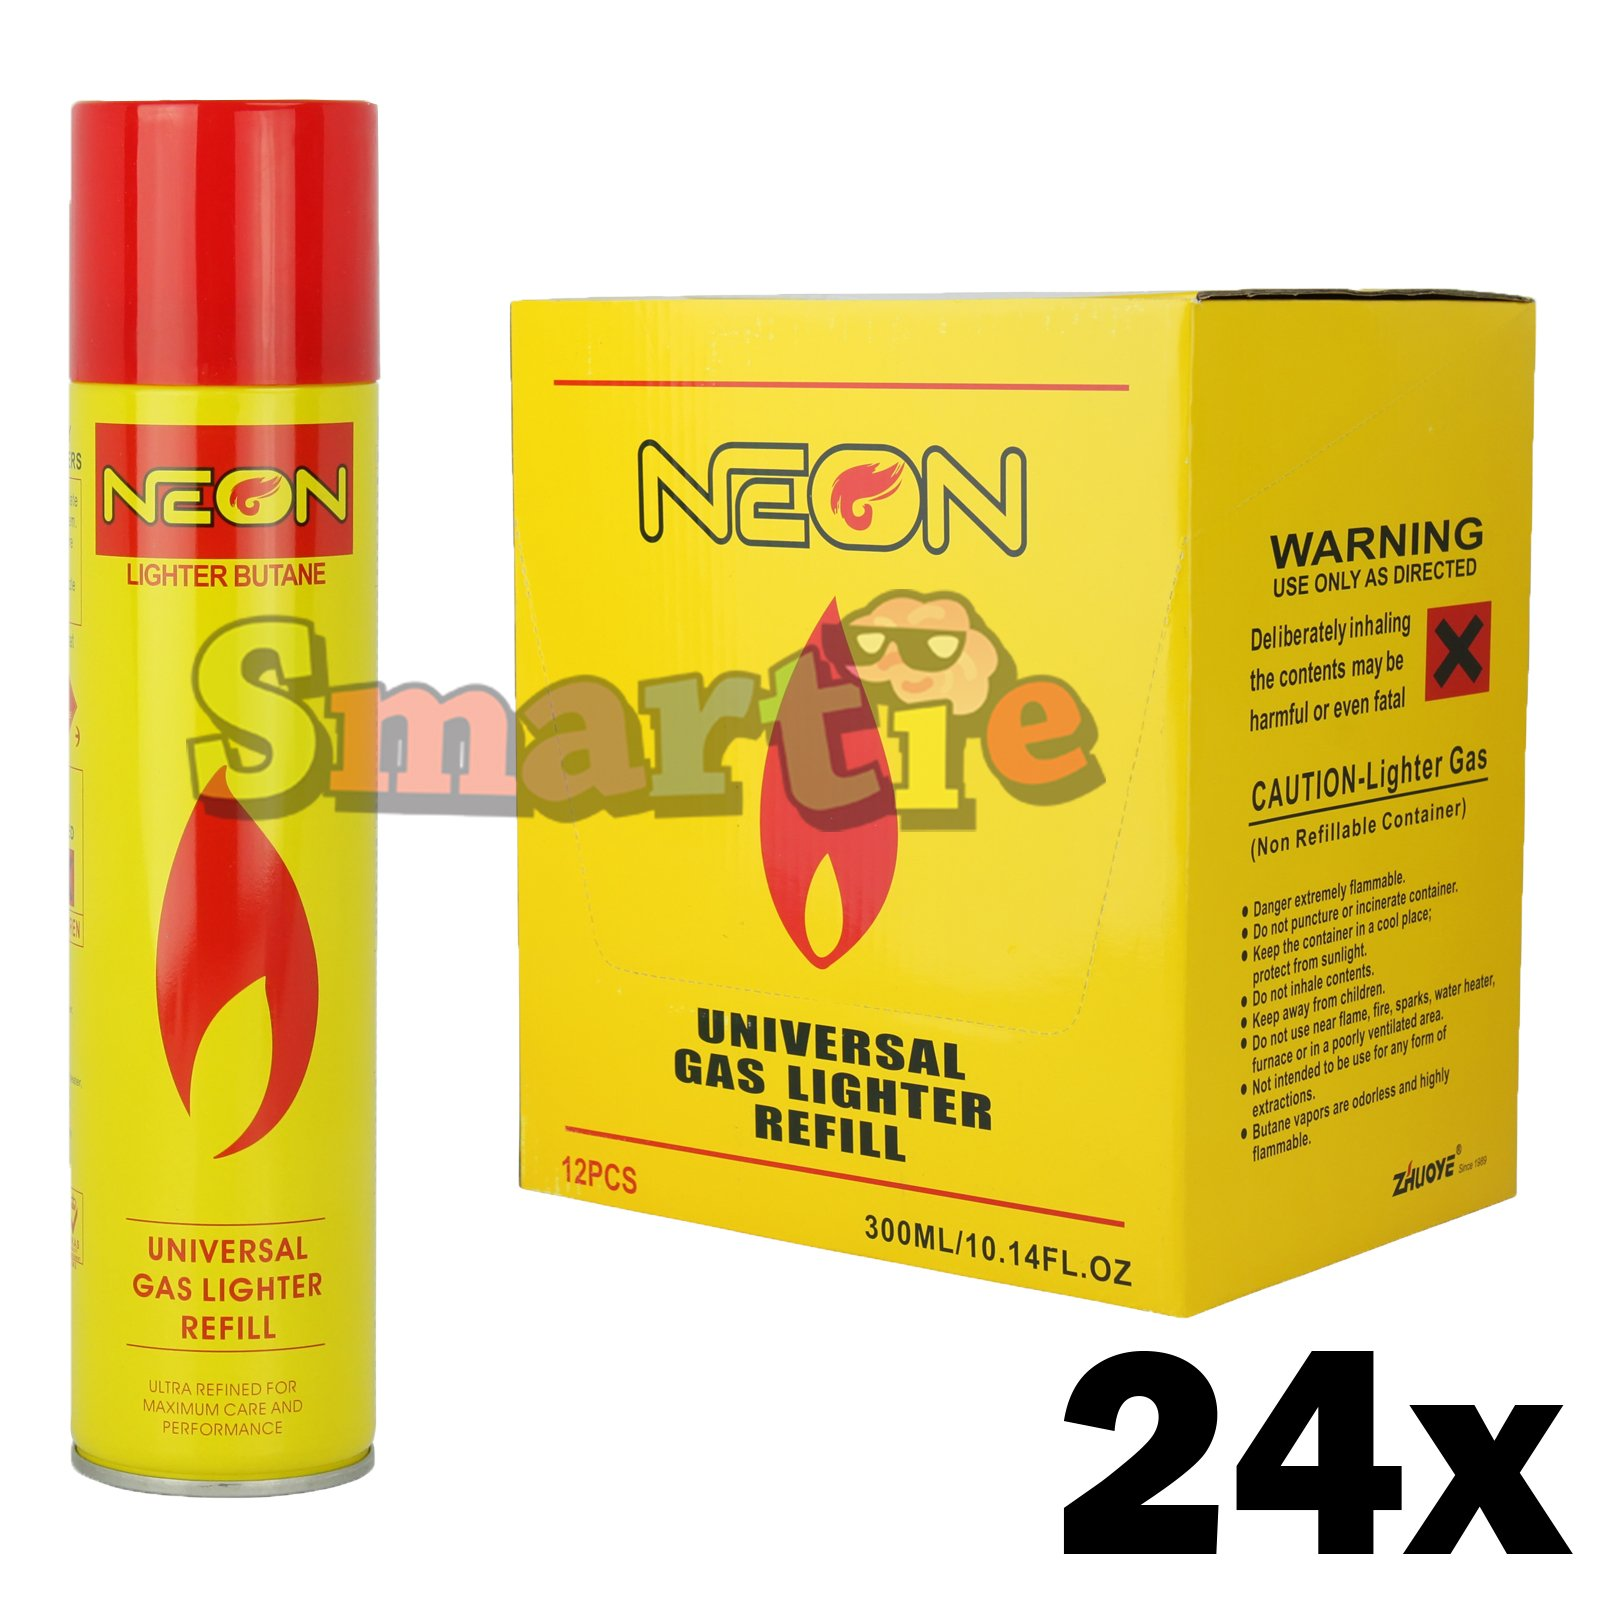 Neon AC1817